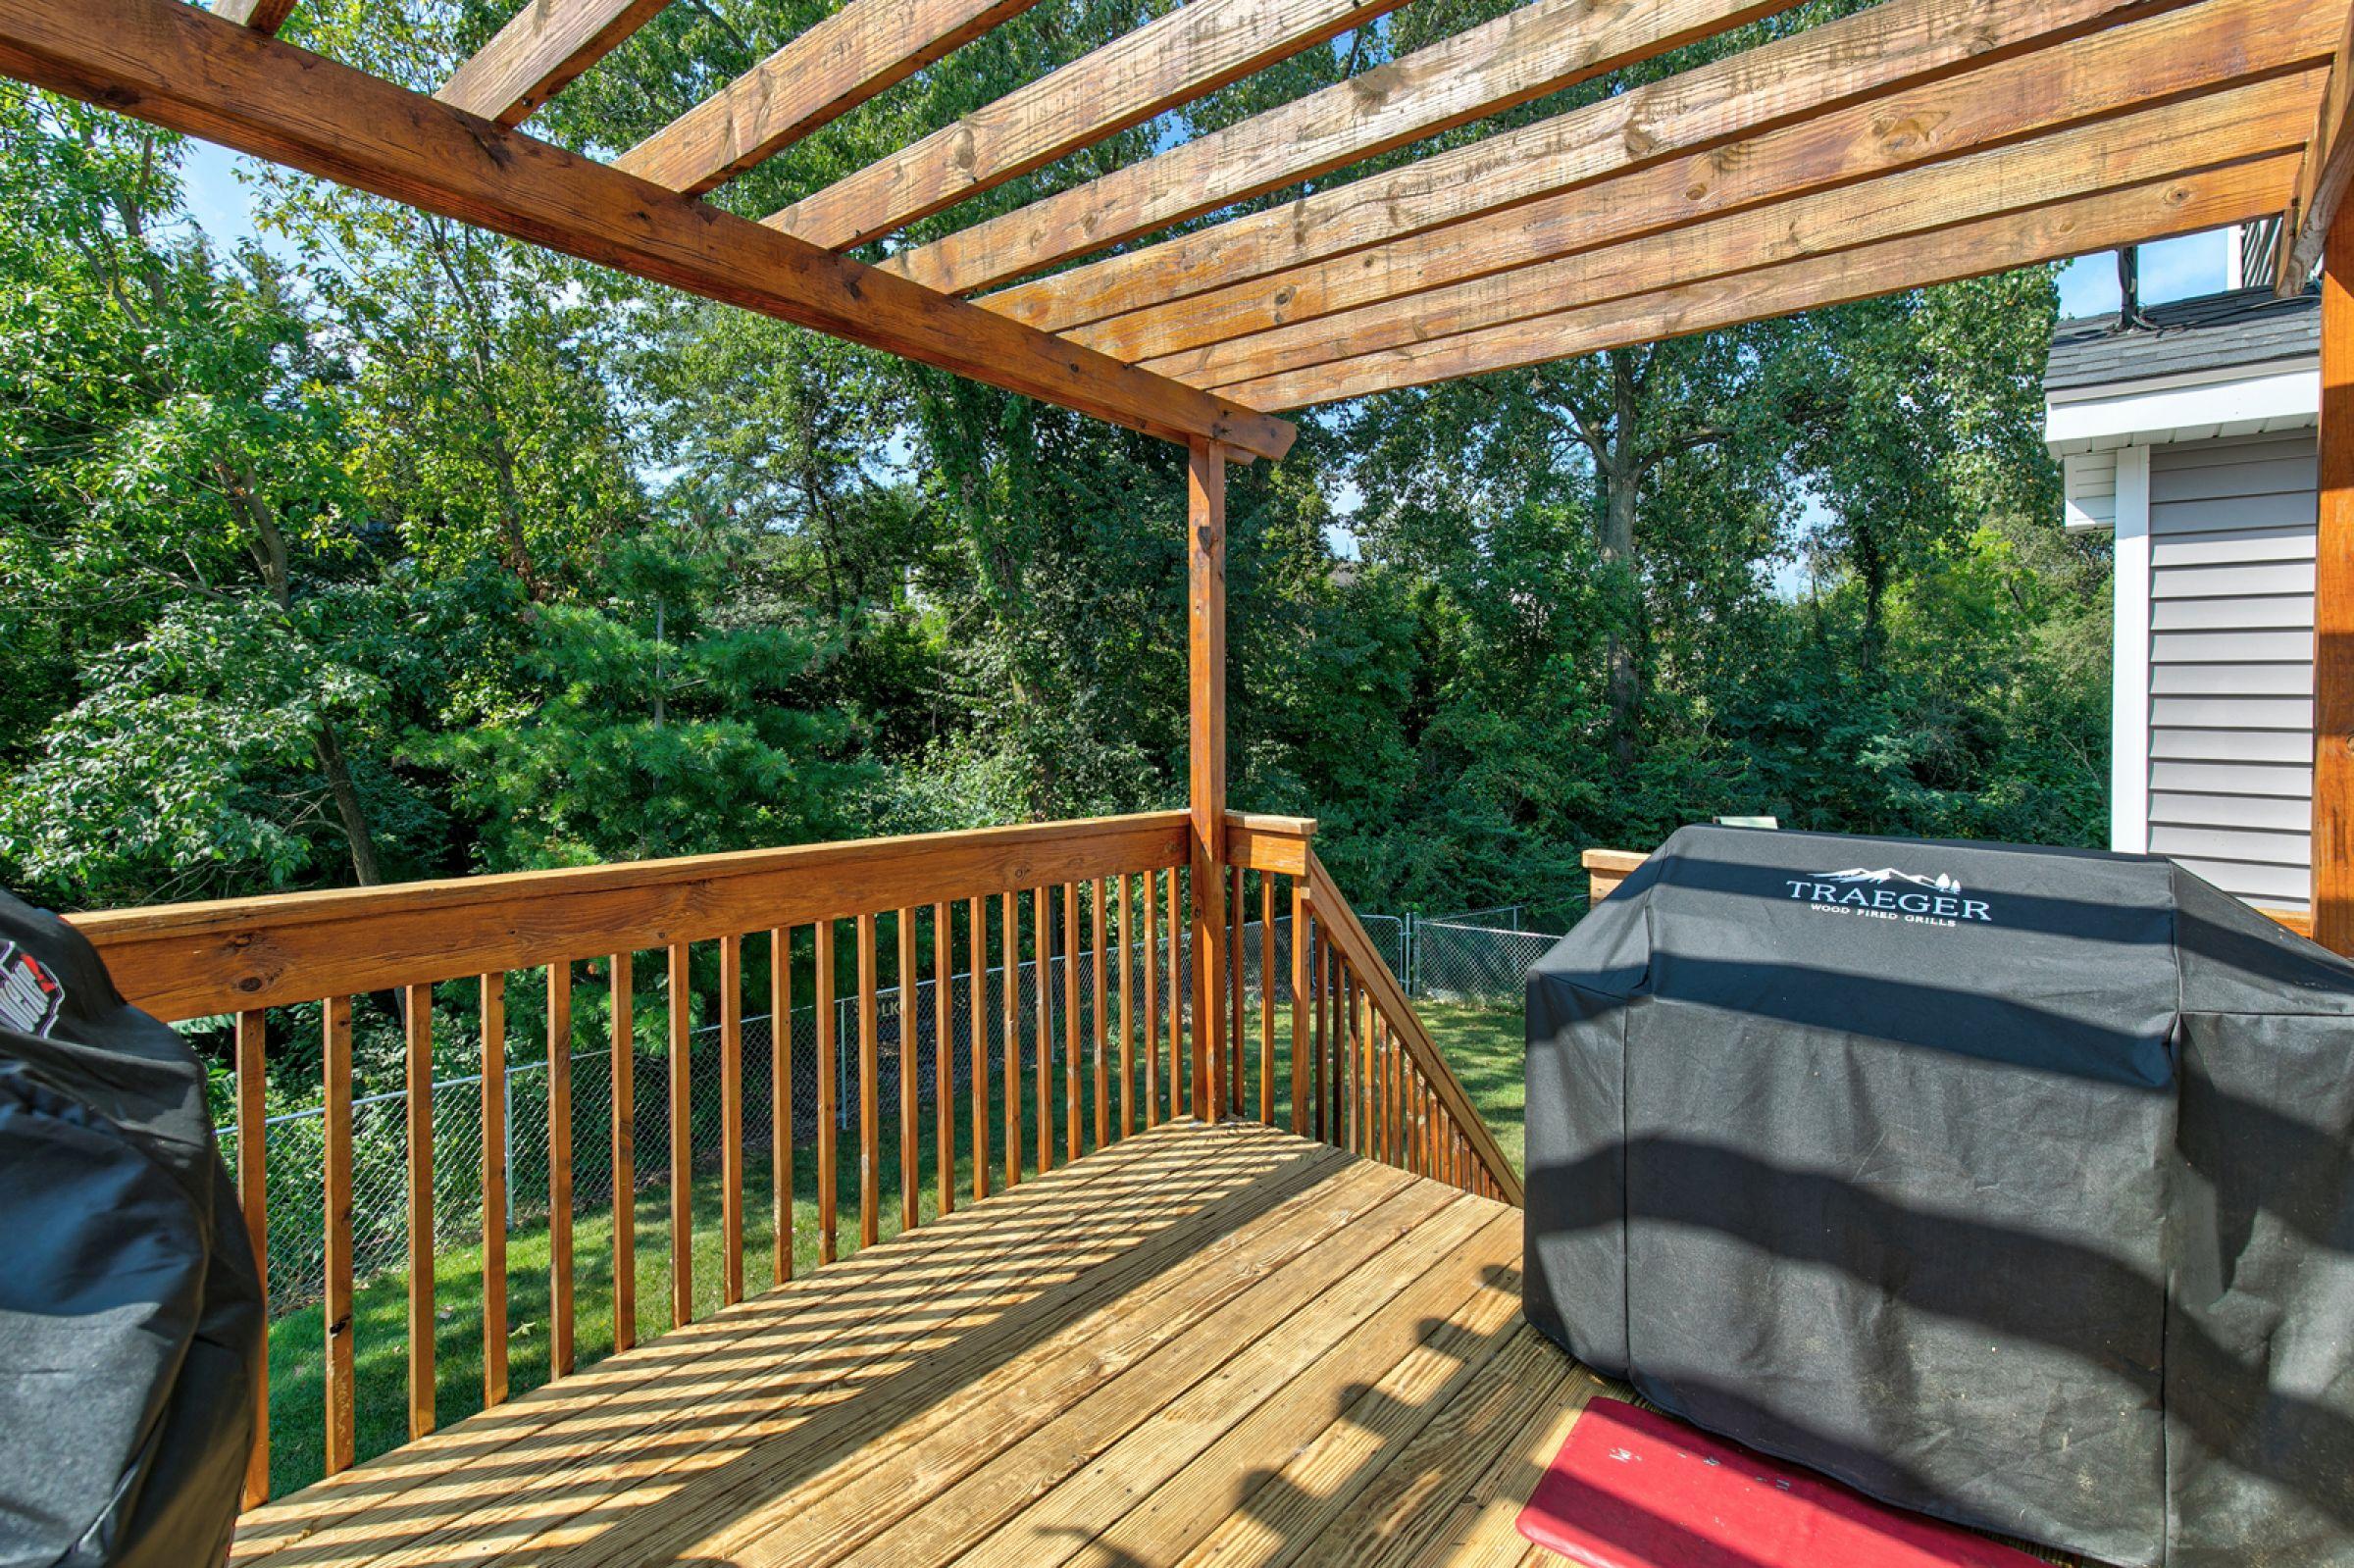 residential-warren-county-iowa-0-acres-listing-number-15685-3-2021-08-31-032507.jpg